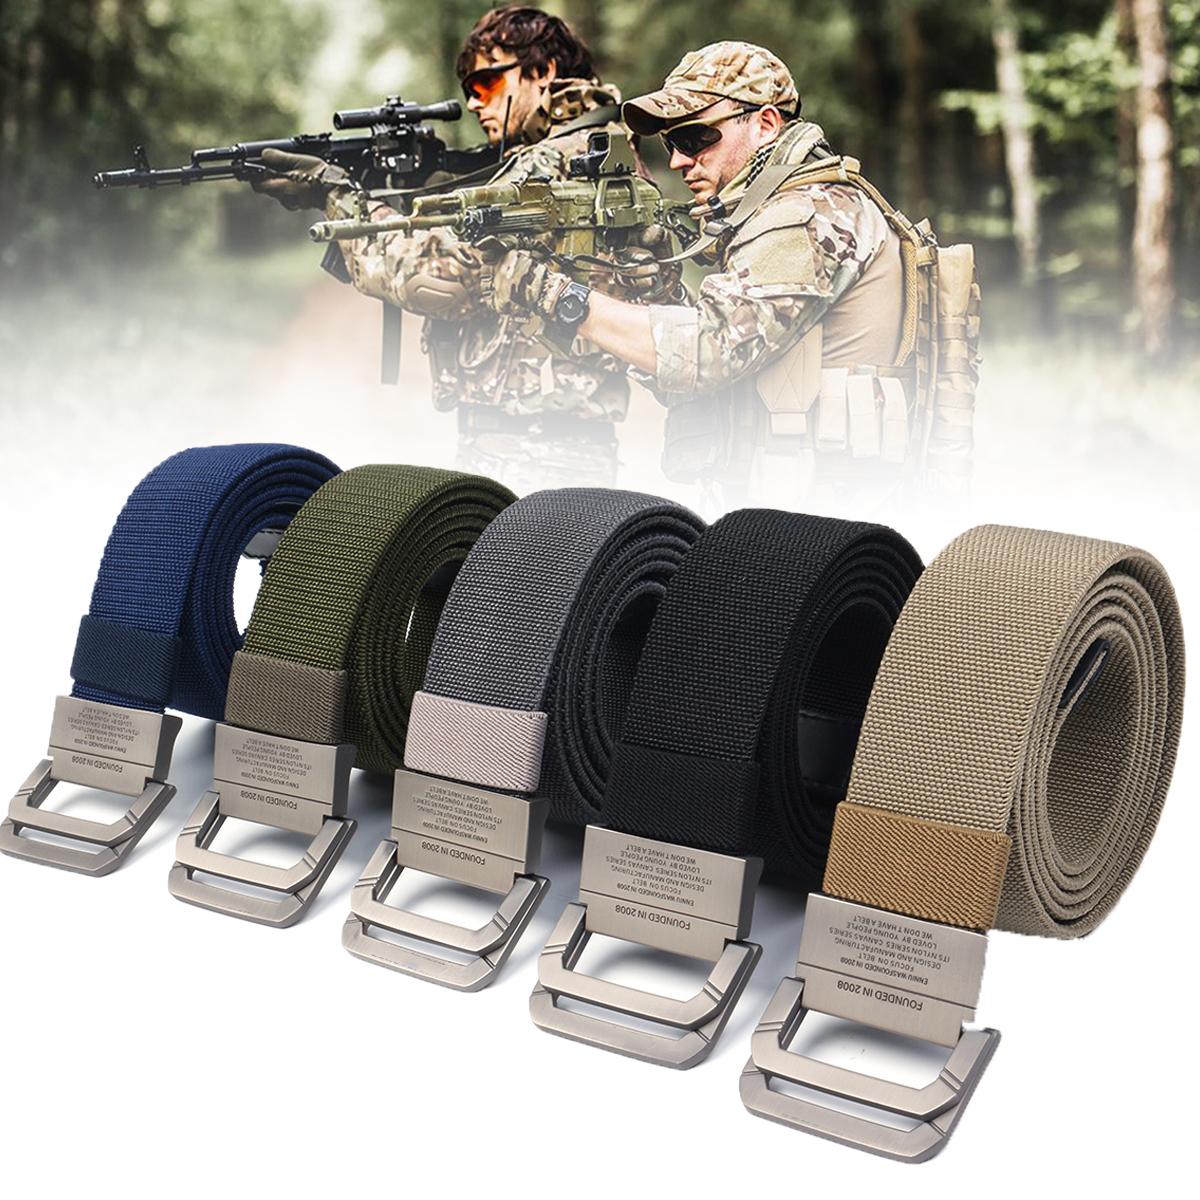 Survival Military Belts Tactical Belt Nylon Waist Belt Strap Military Emergency EDC Gadget